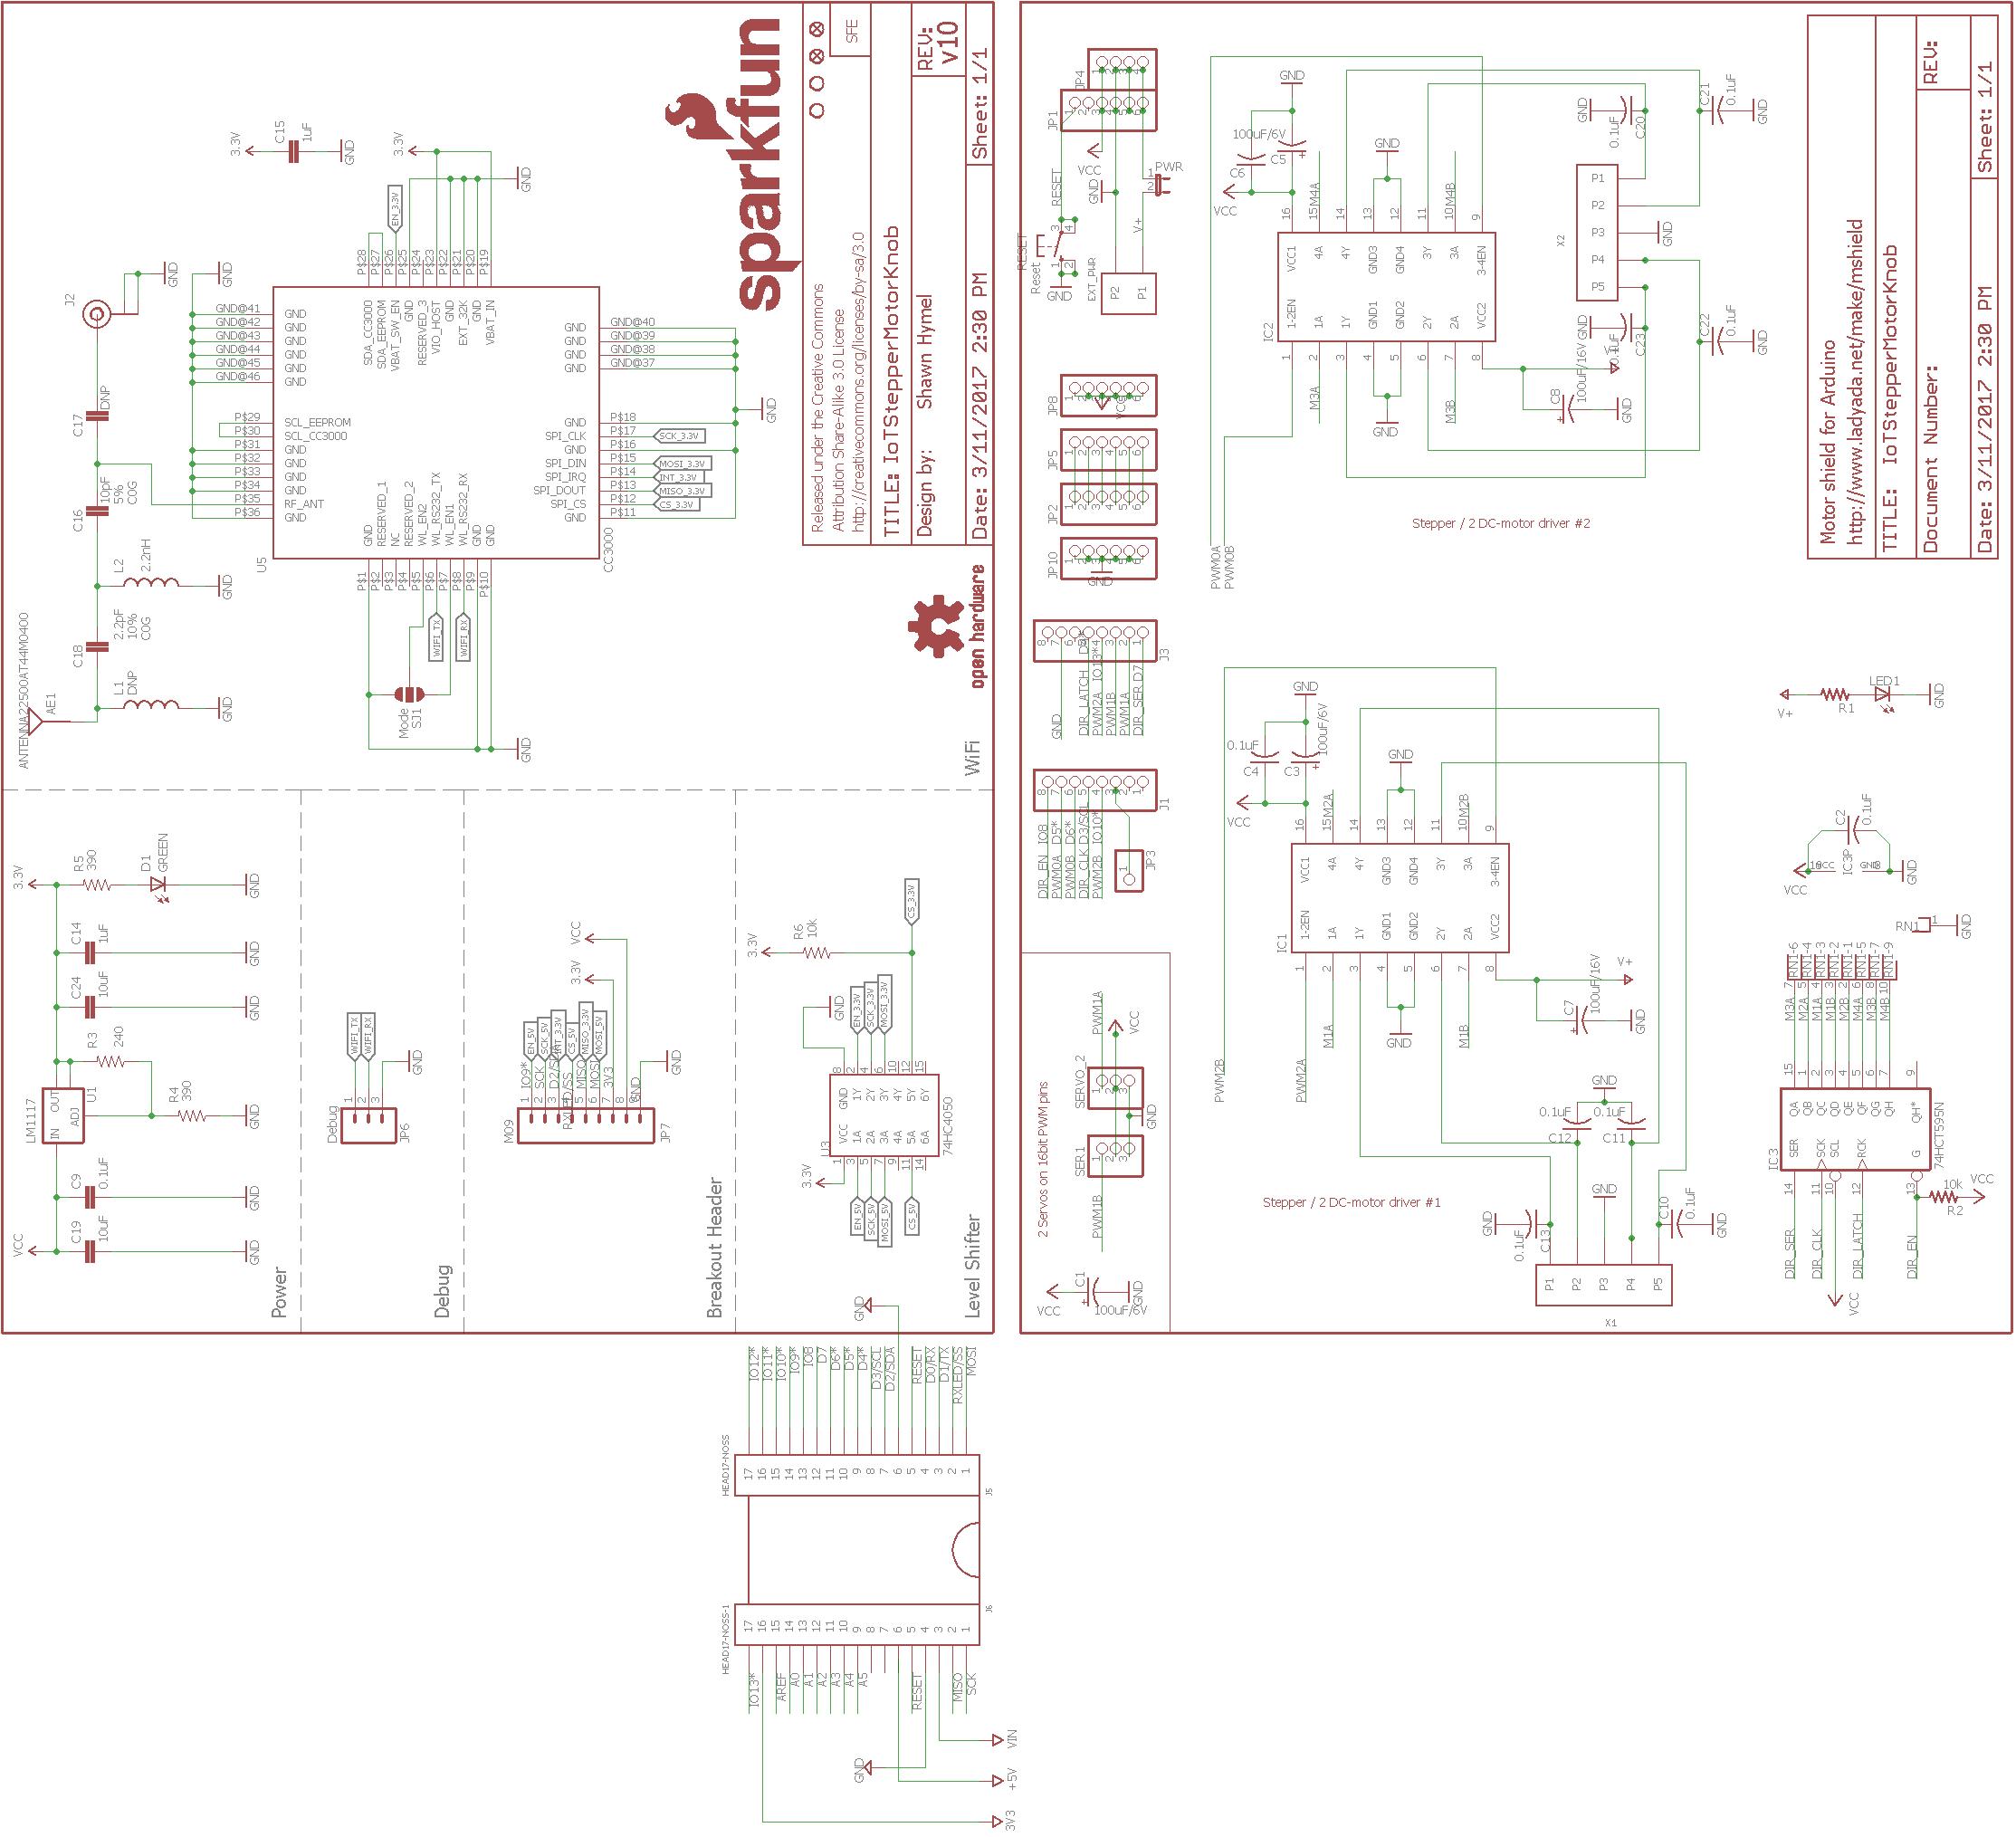 Iot Stepper Motor Controller Circuit Diagram On Step Wiring Iotsteppermschm Krqk28bjef